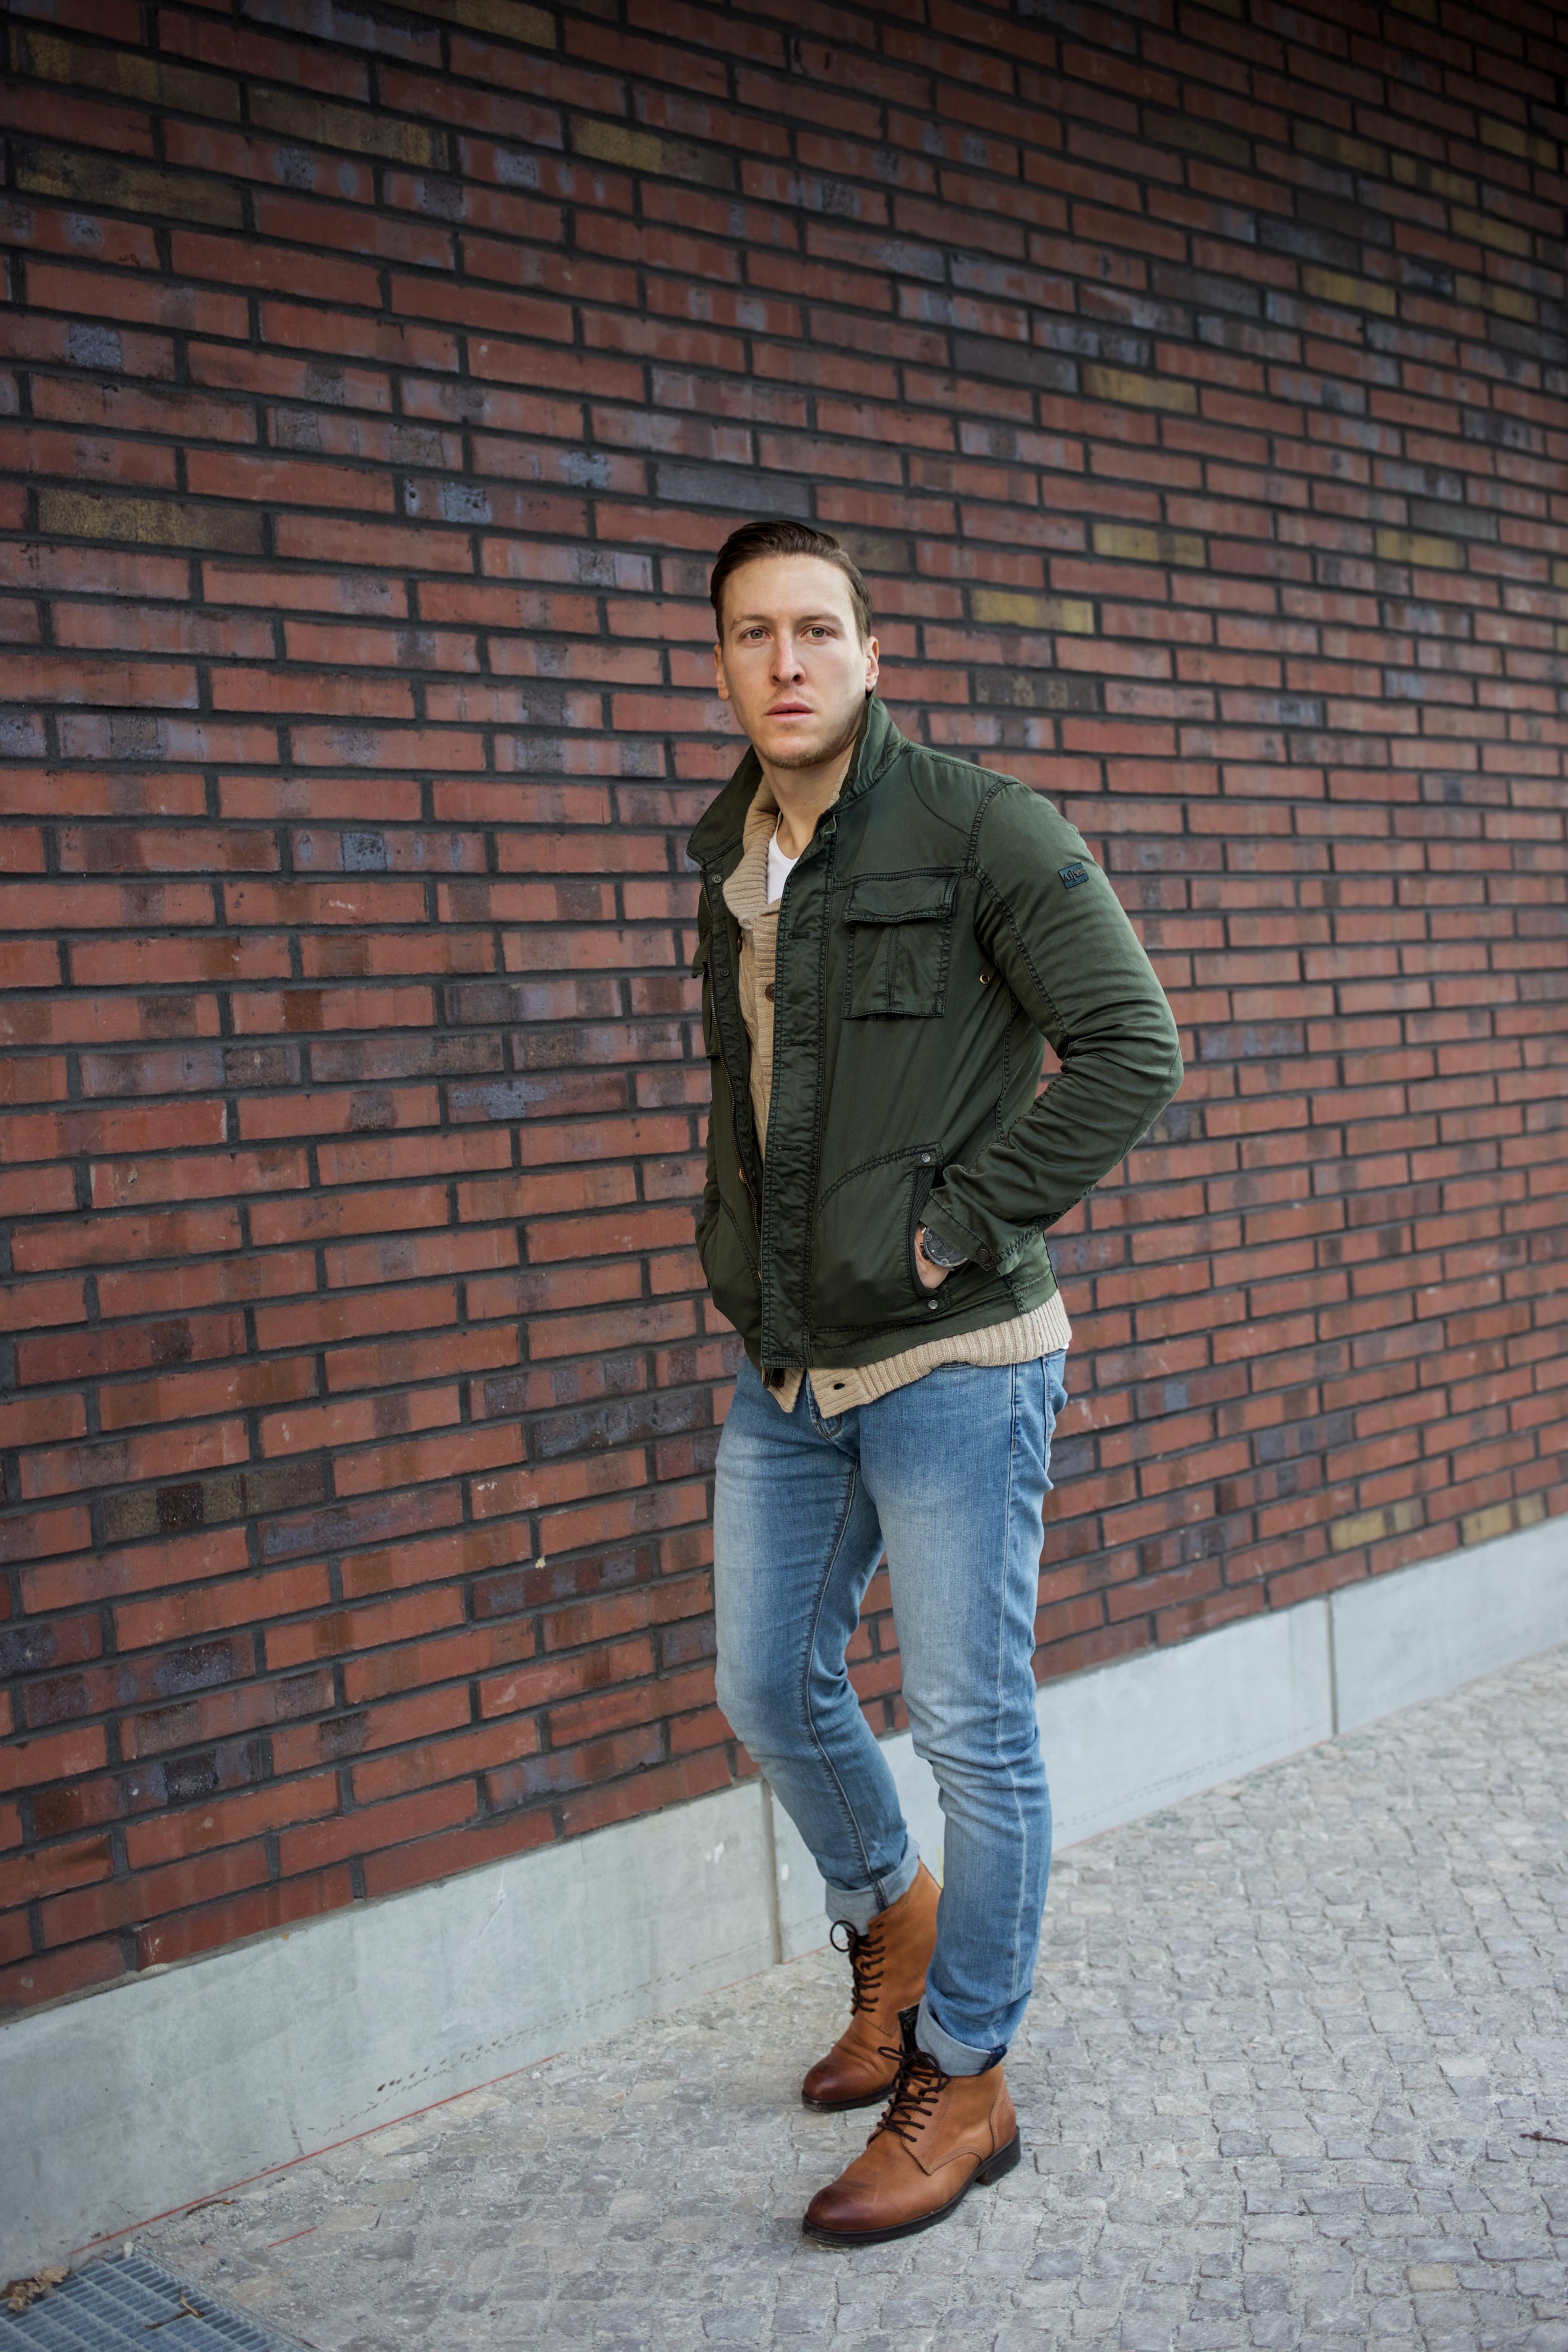 strickjacke-kombinieren-männer-beige-cardigan-blue-jeans-fashionblog-berlin-modeblog_8932